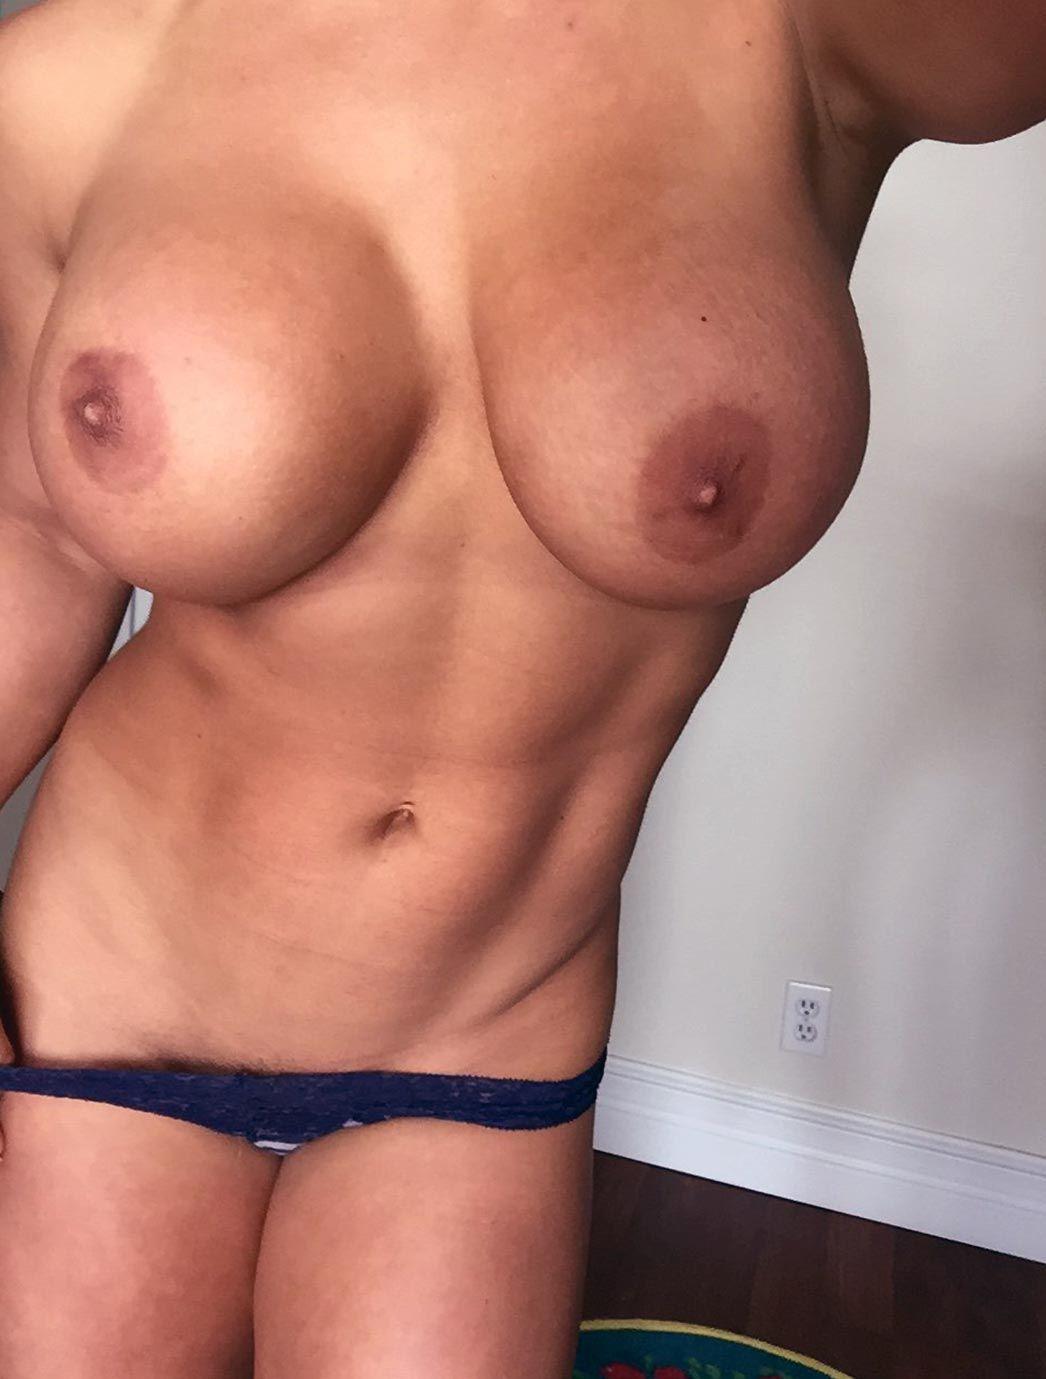 Celeste Bonin Nude Leaked The Fappening & Sexy 0205